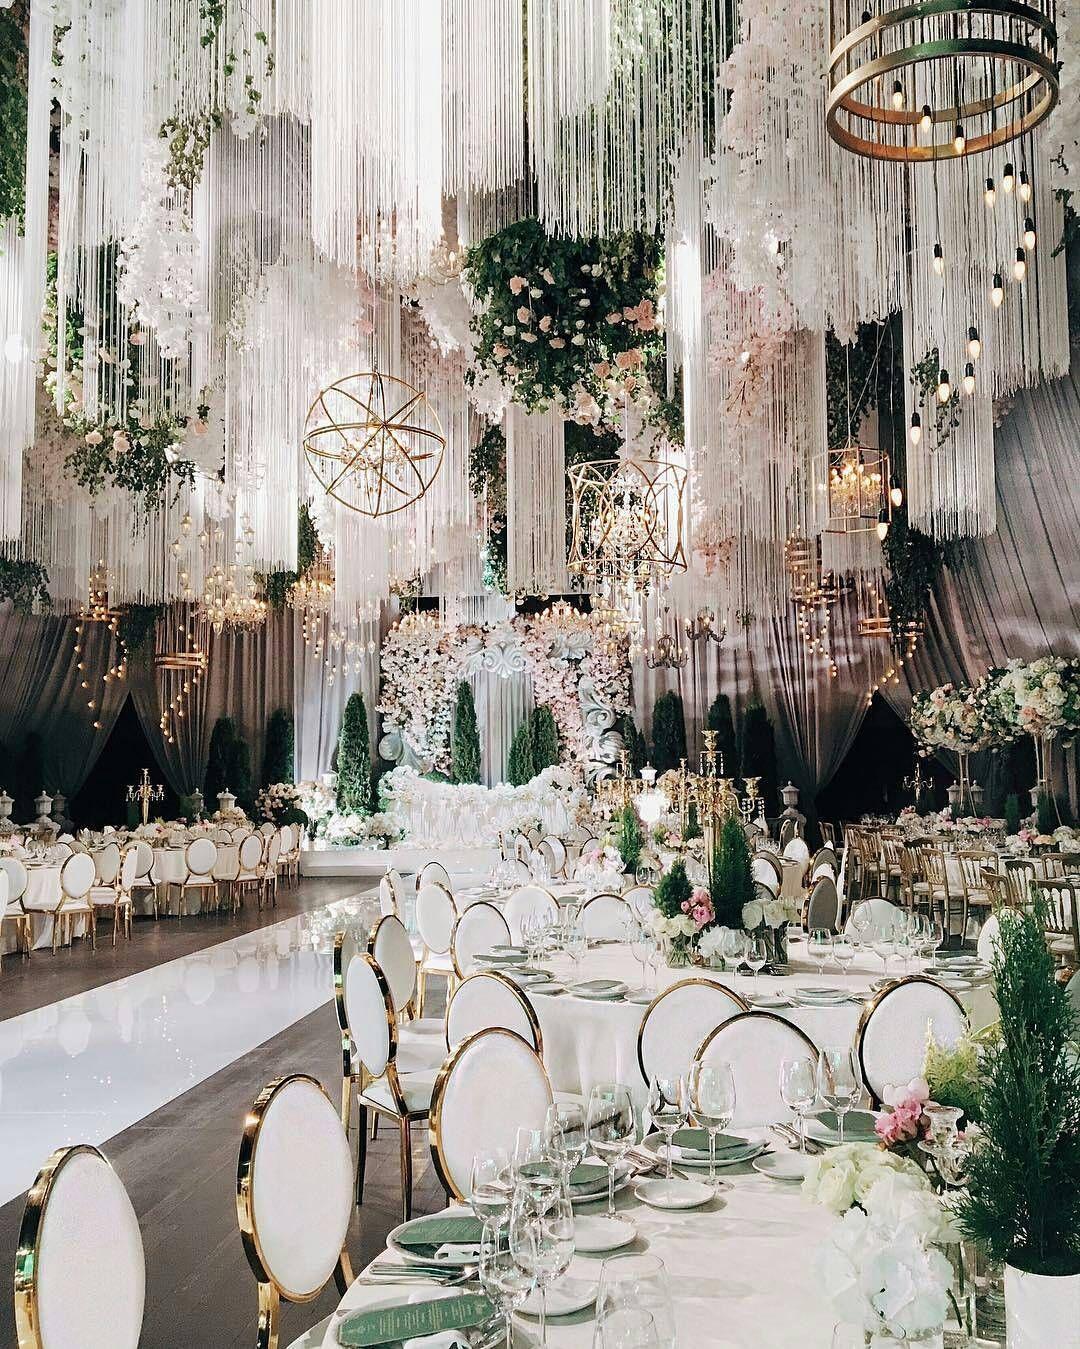 Nigerian wedding decoration images  Pin by DzulFadhli Saffuan Ridzuan on Wedding Plan  Pinterest